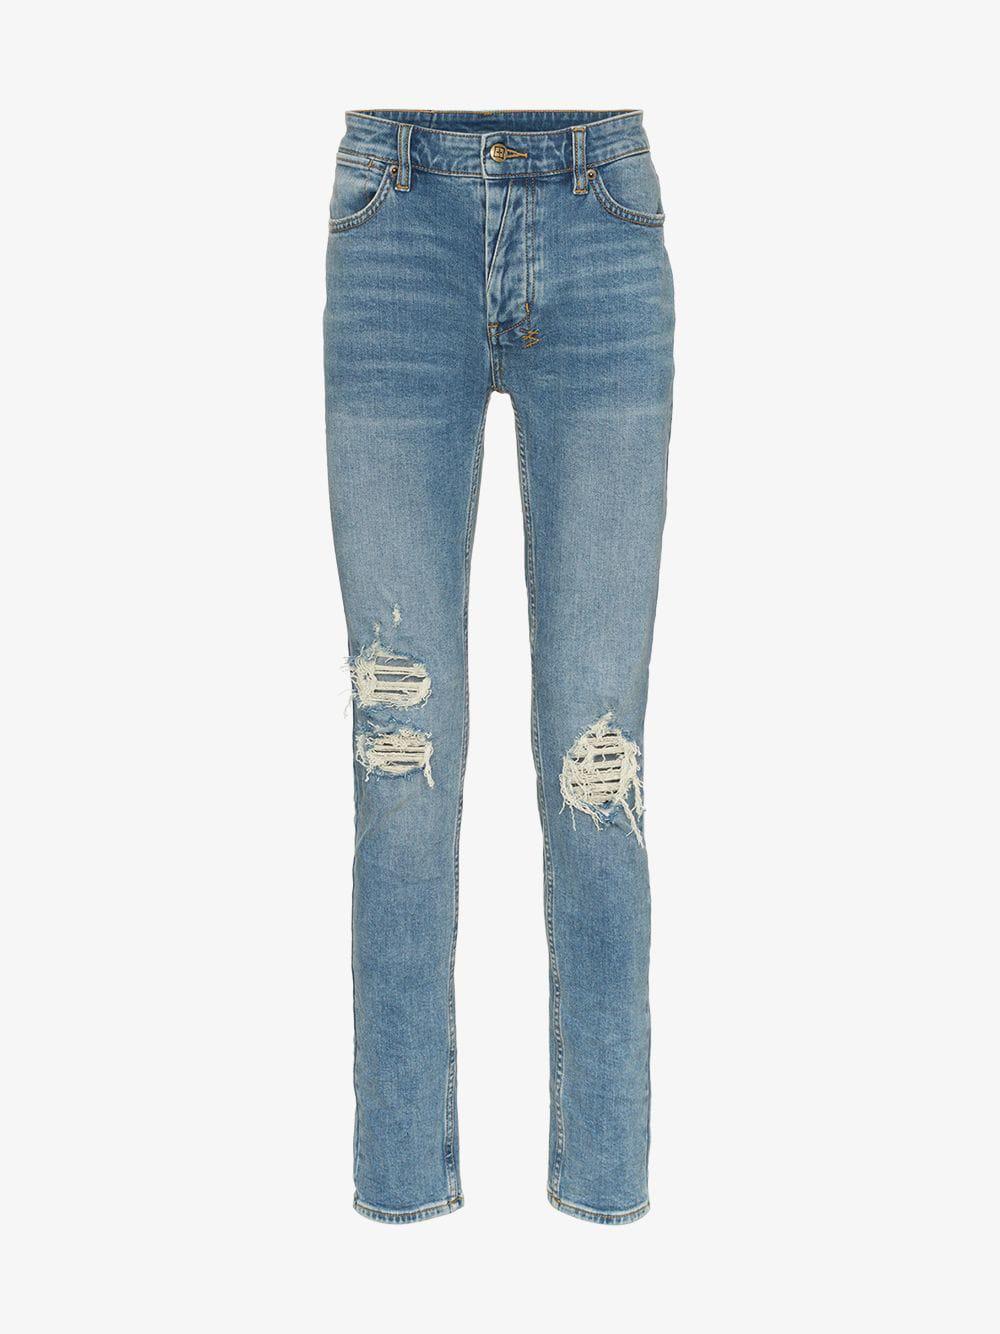 ee39d41d75d Ksubi - Blue Van Winkle No Glory Jeans for Men - Lyst. View fullscreen